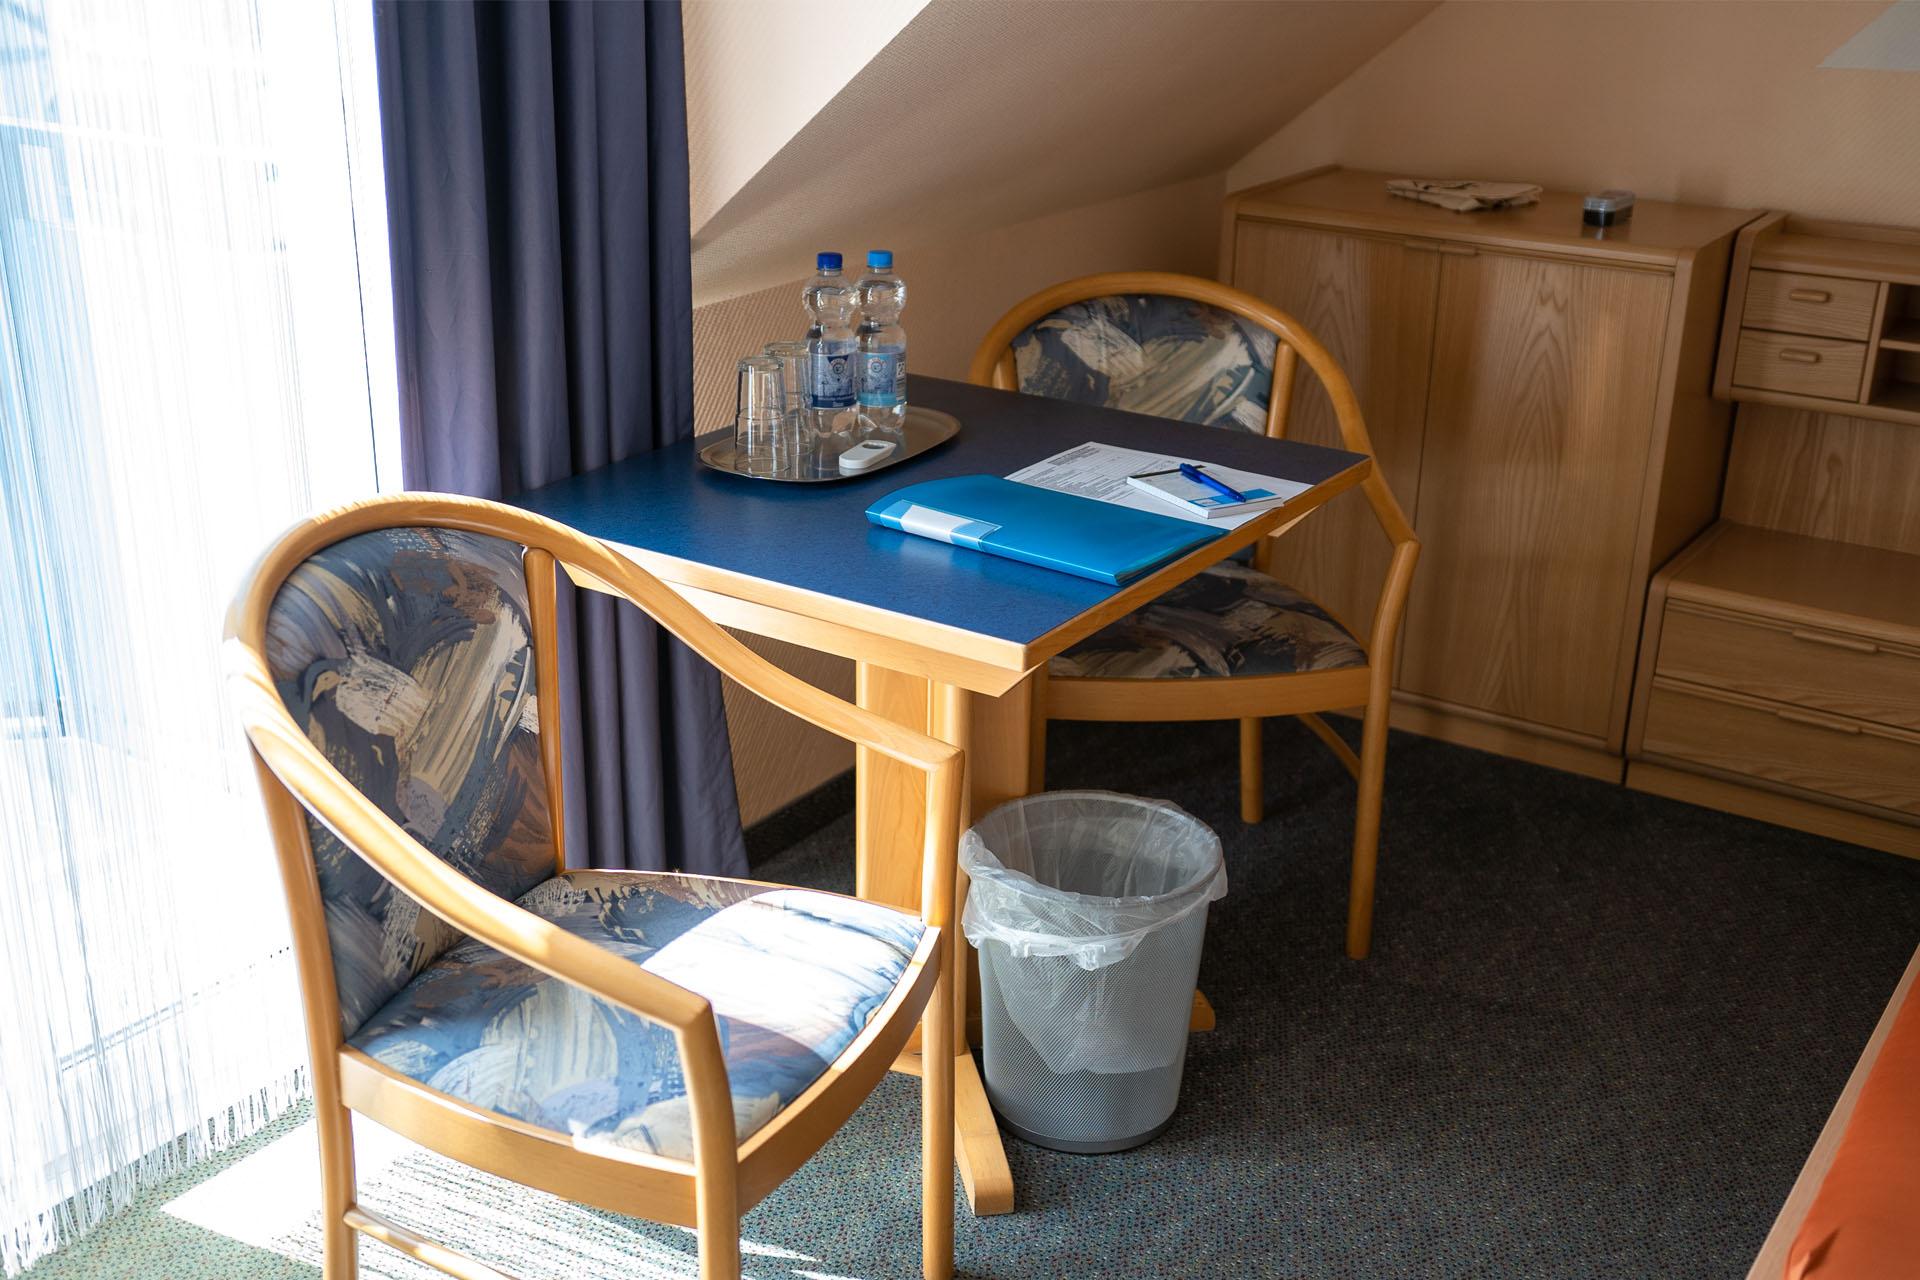 Hotel_Aggertal_Zimmer_Doppelzimmer_Sitzecke